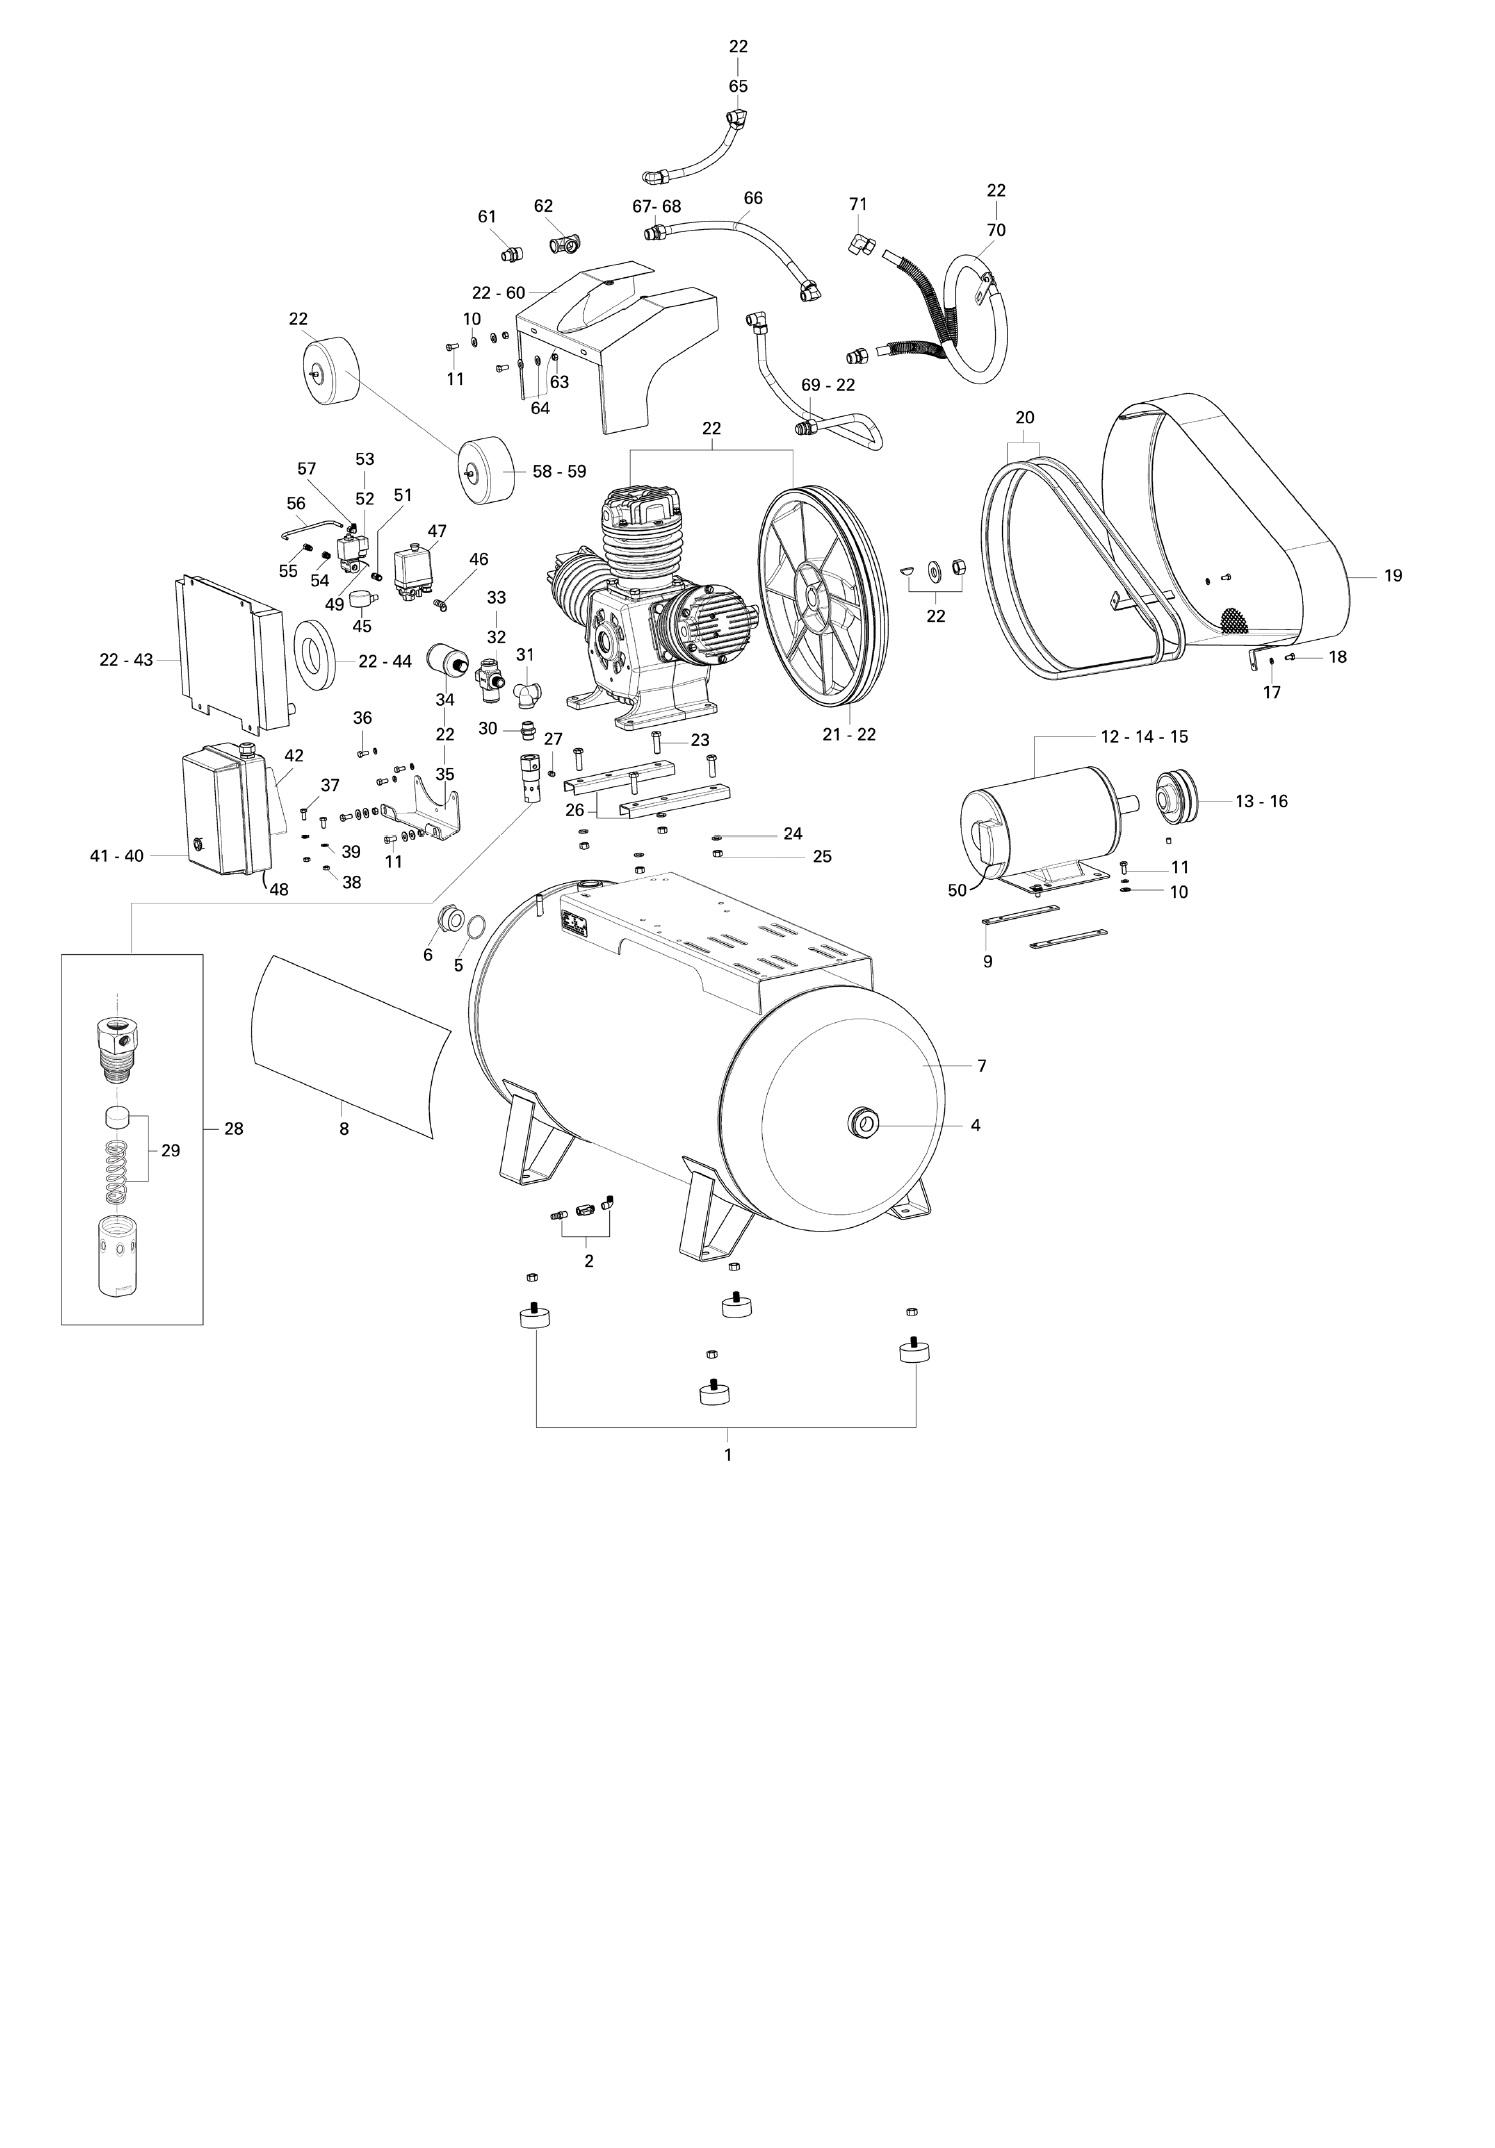 hight resolution of schulz oilless air compressor csw 60 420 15 hp 60 cfm